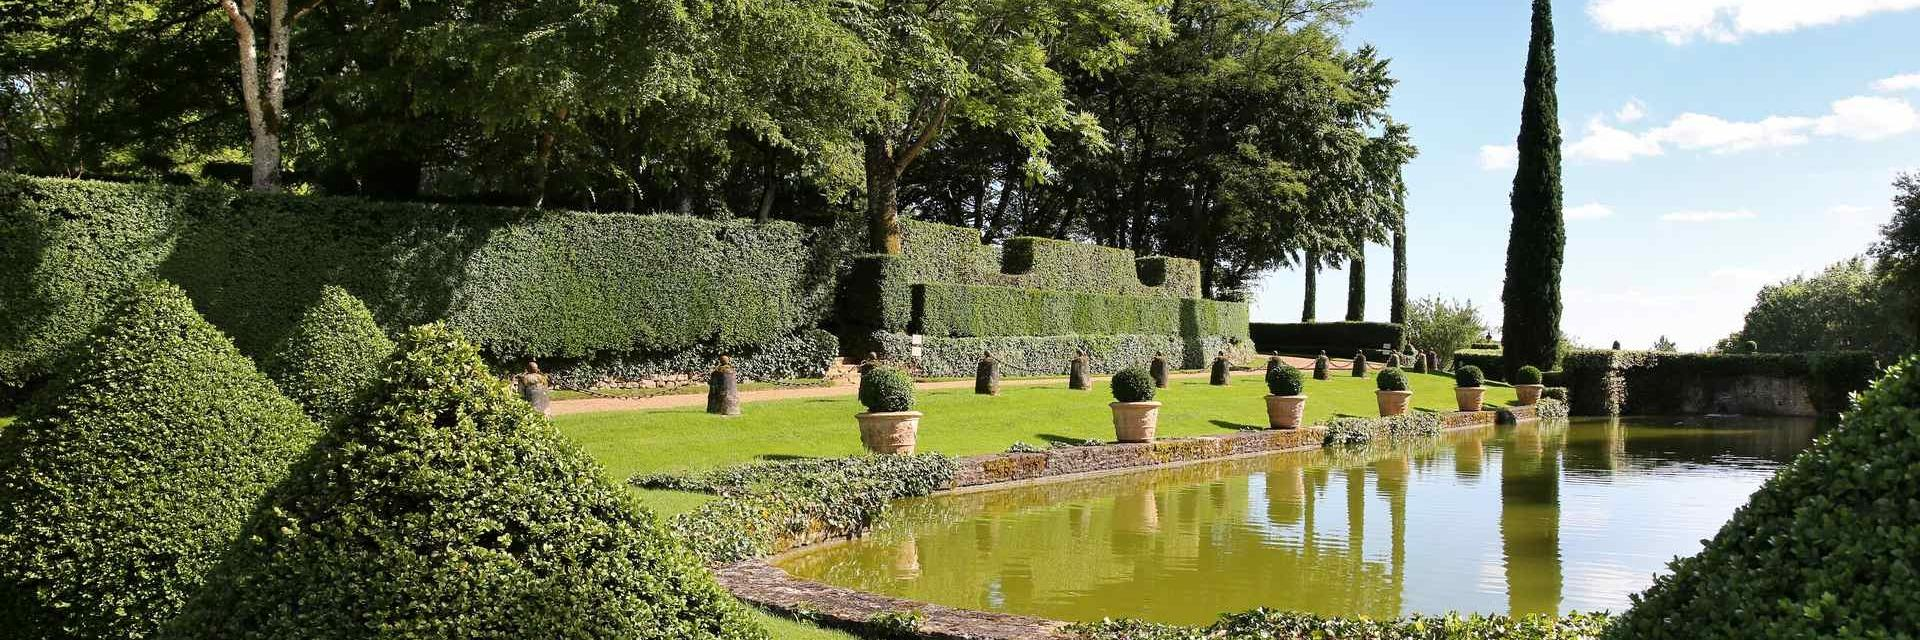 miroir deau deyrignac jrome morel - Jardin D Eyrignac